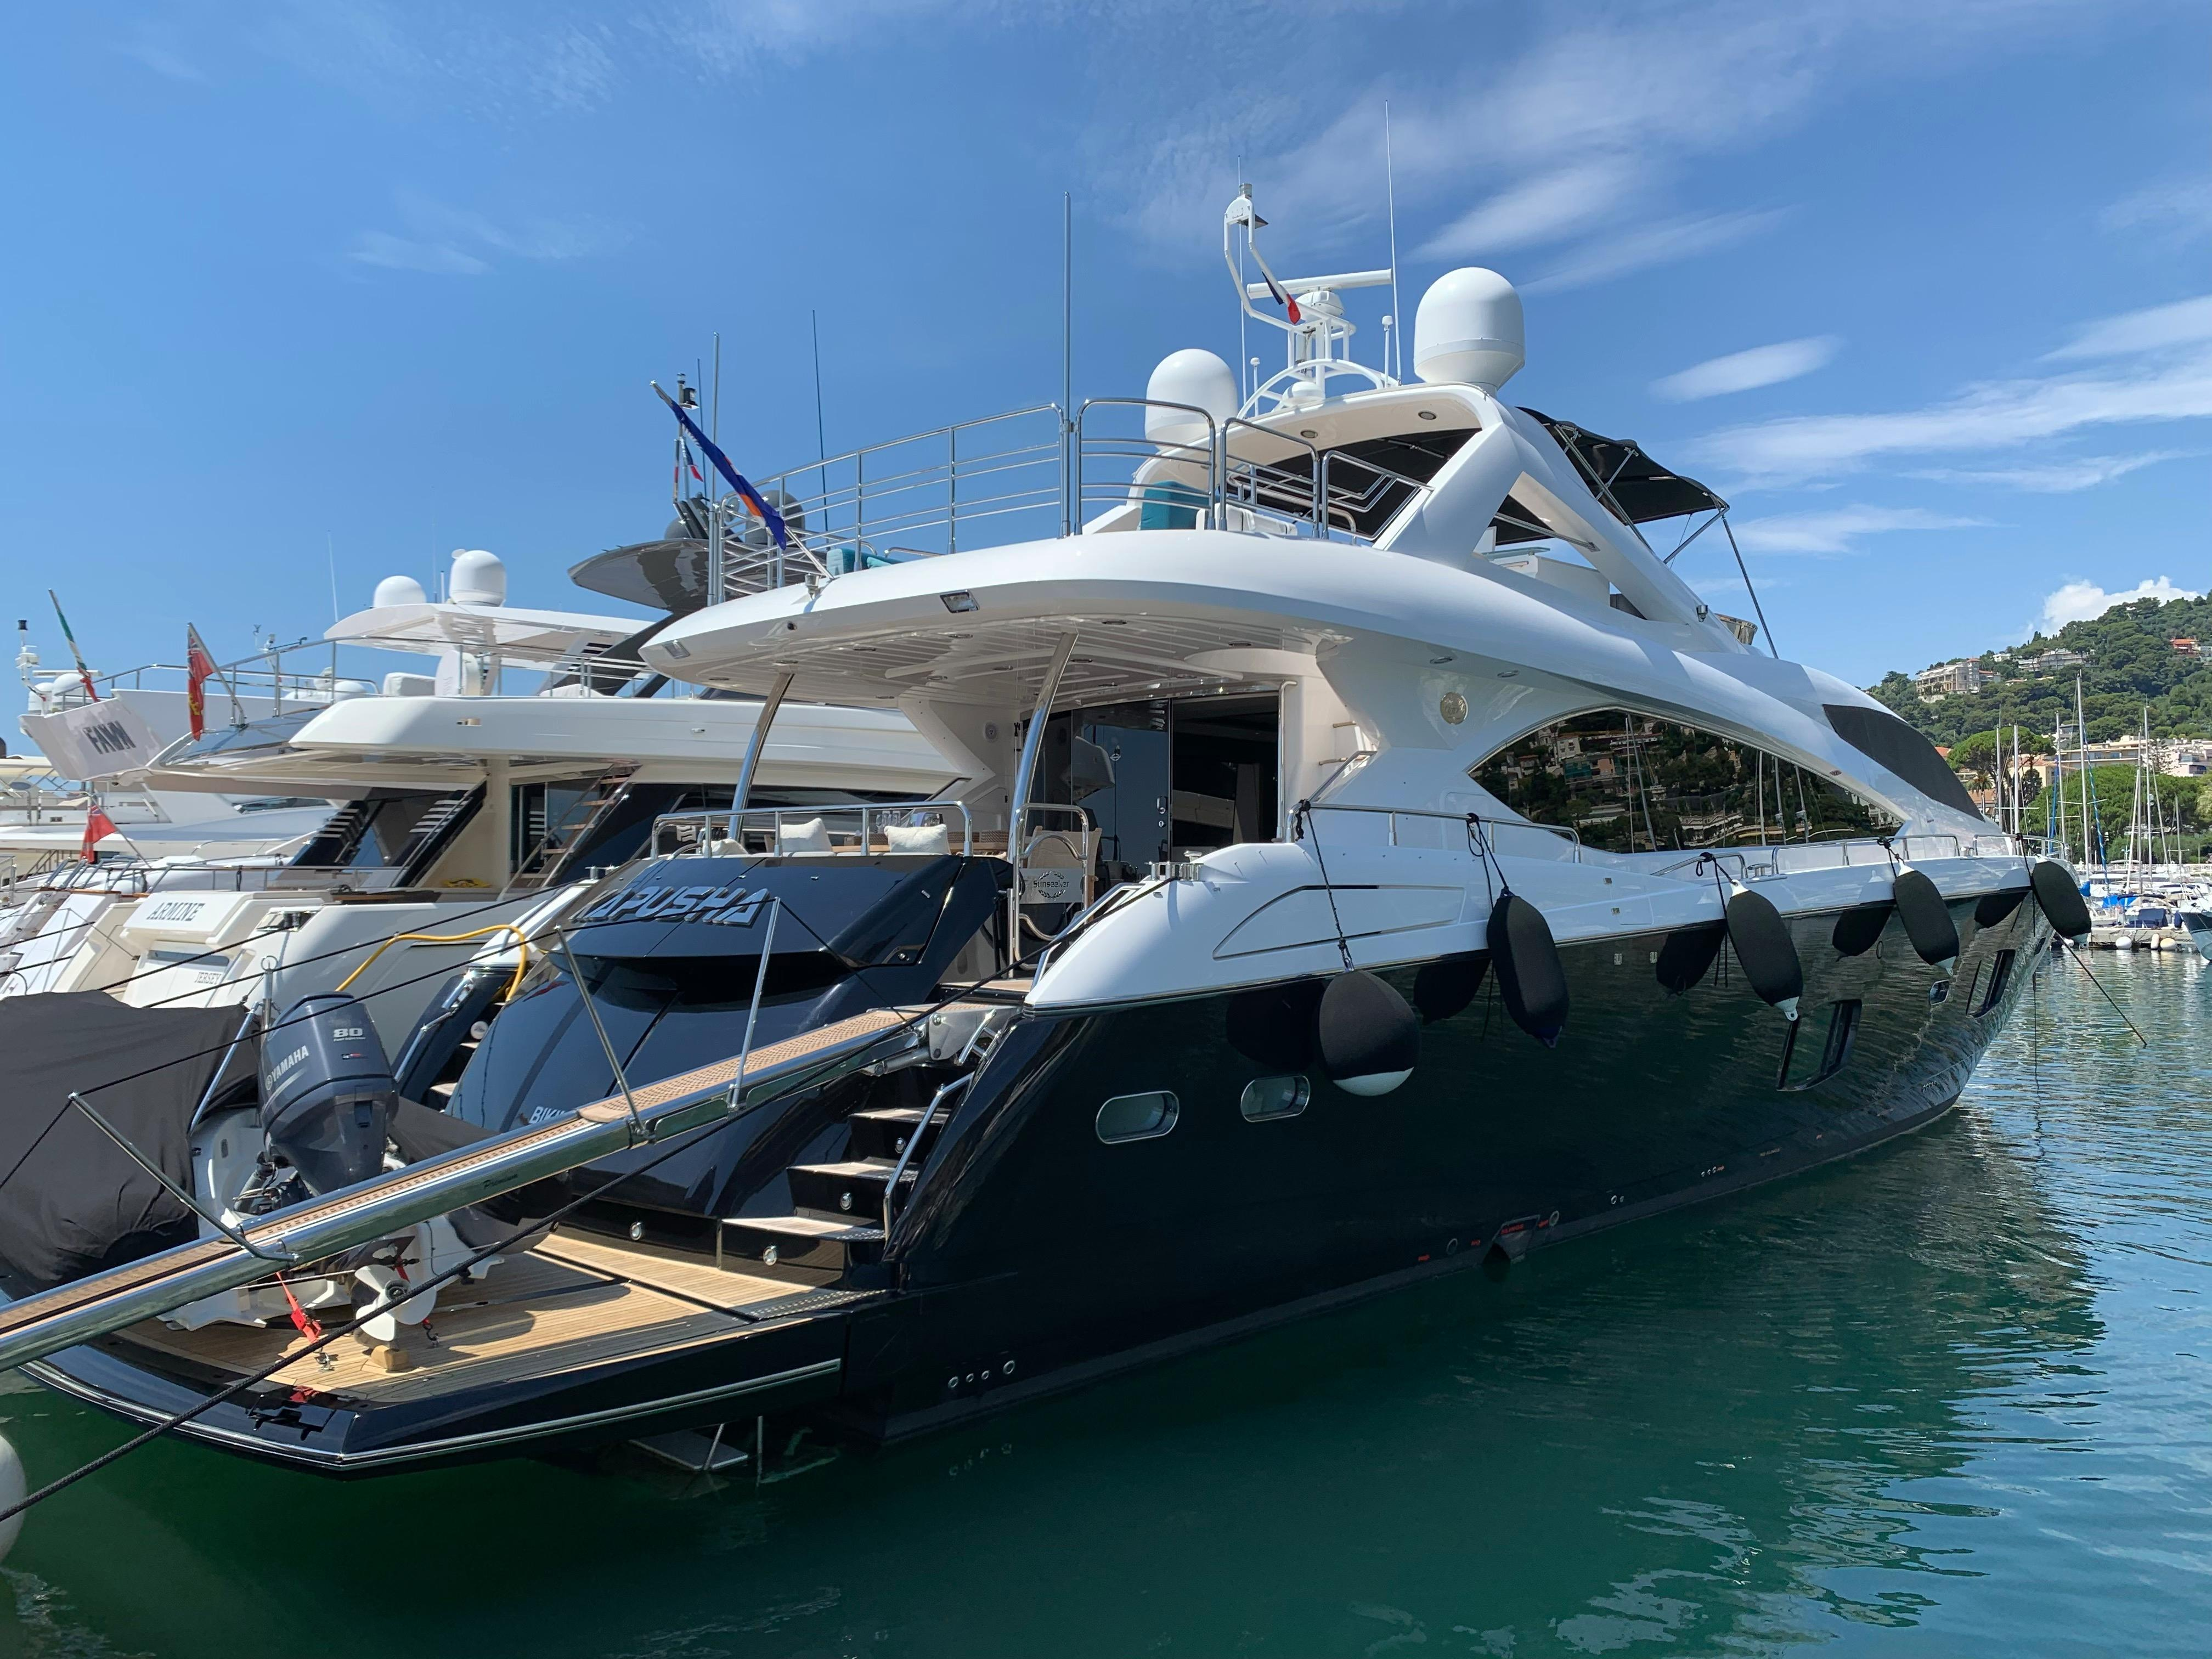 2011 Sunseeker 88 Yacht Motor Båt til salgs